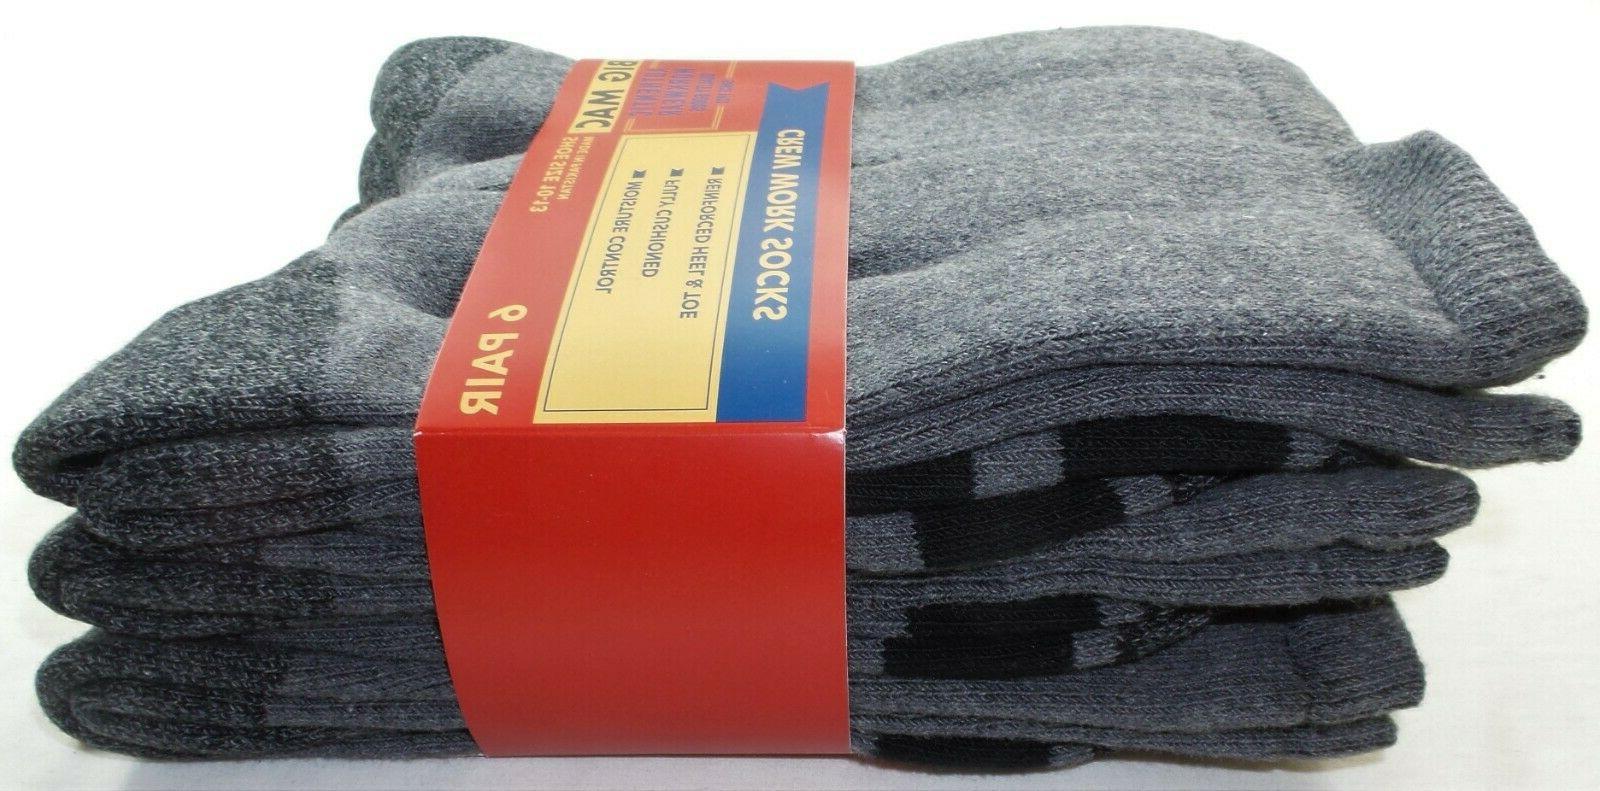 Big Mac Boot Work Socks 6 Pack Grey Cotton Cushioned